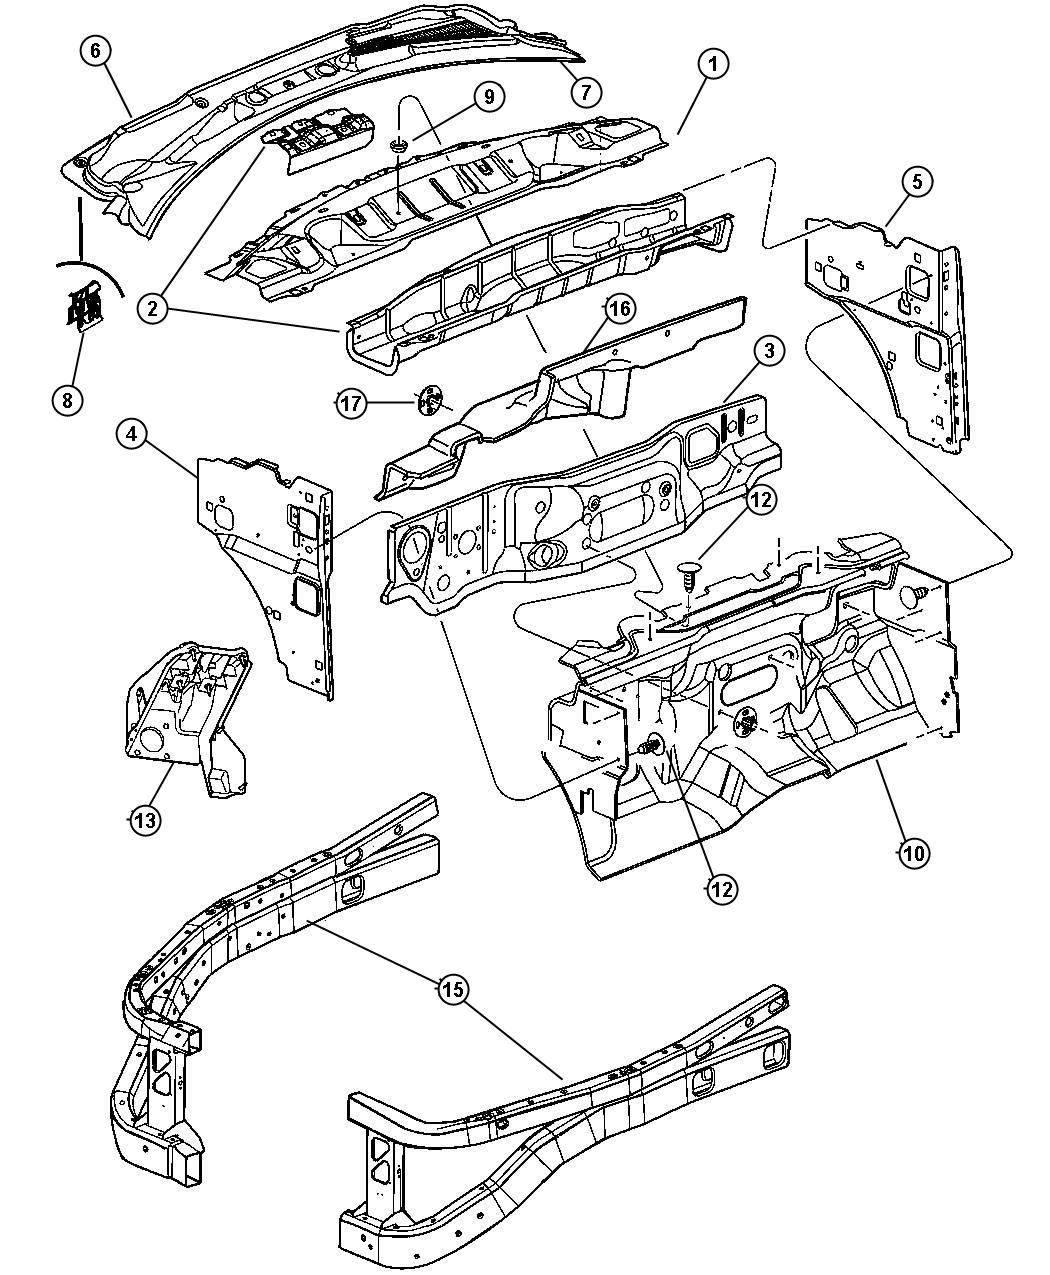 2004 Dodge Durango Panel Cowl Grille Wiper Windshield Washer 55362453ak Mopar Parts Inc